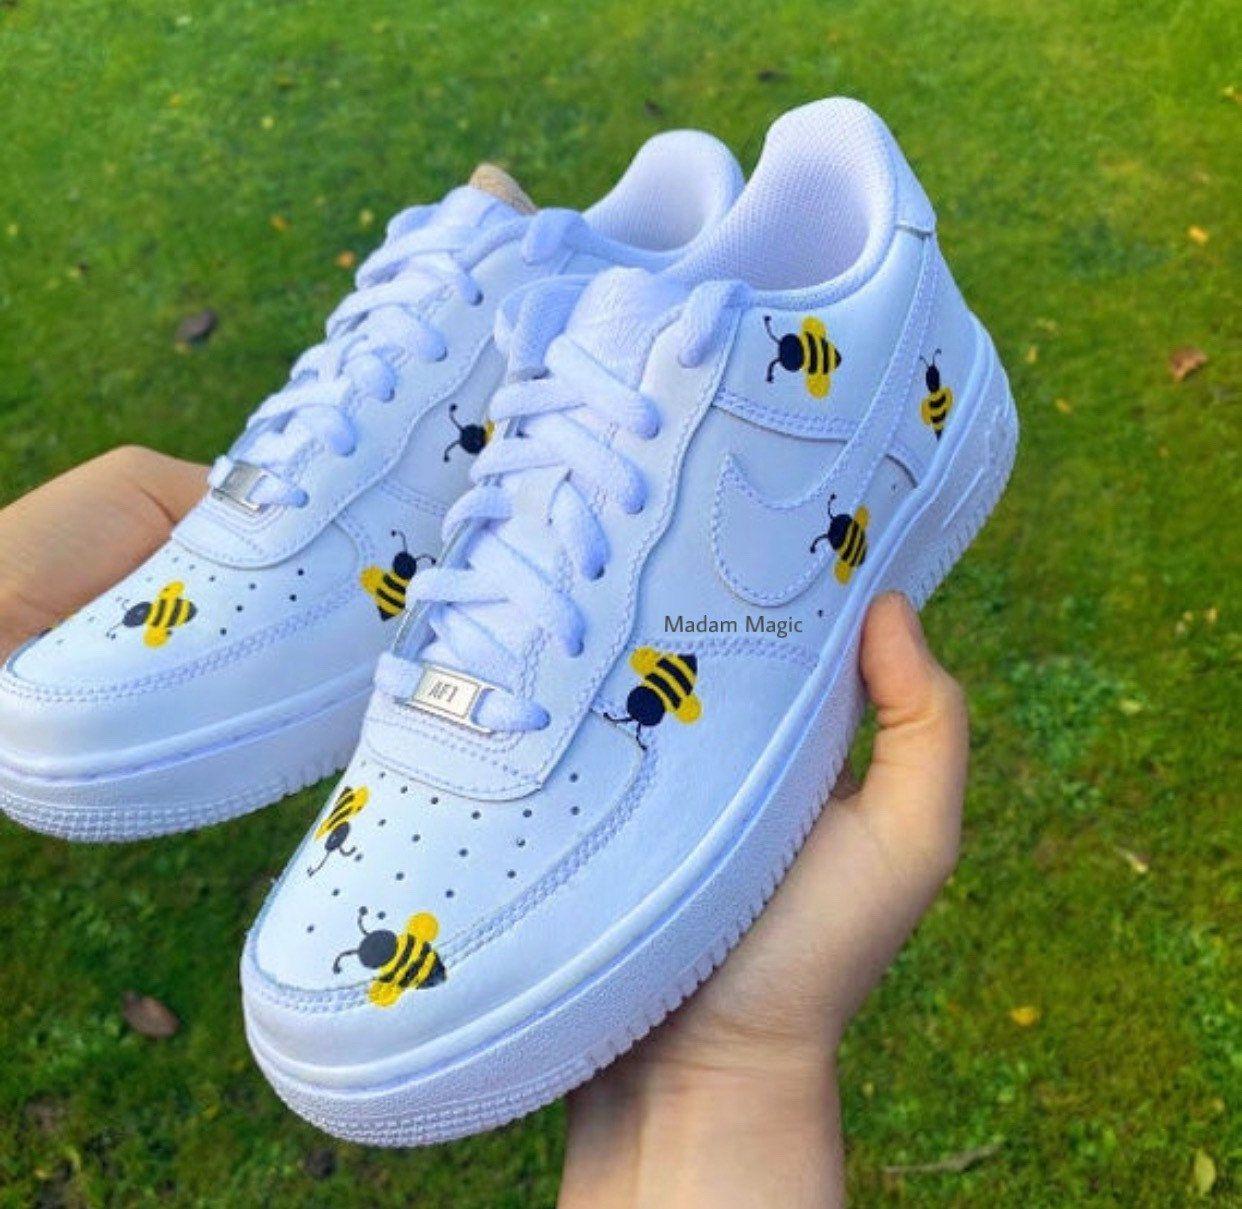 Hand Painted Custom Nike Air Force 1 Low Bee Air Force Custom Sneakers Custom Trainers Made to Order